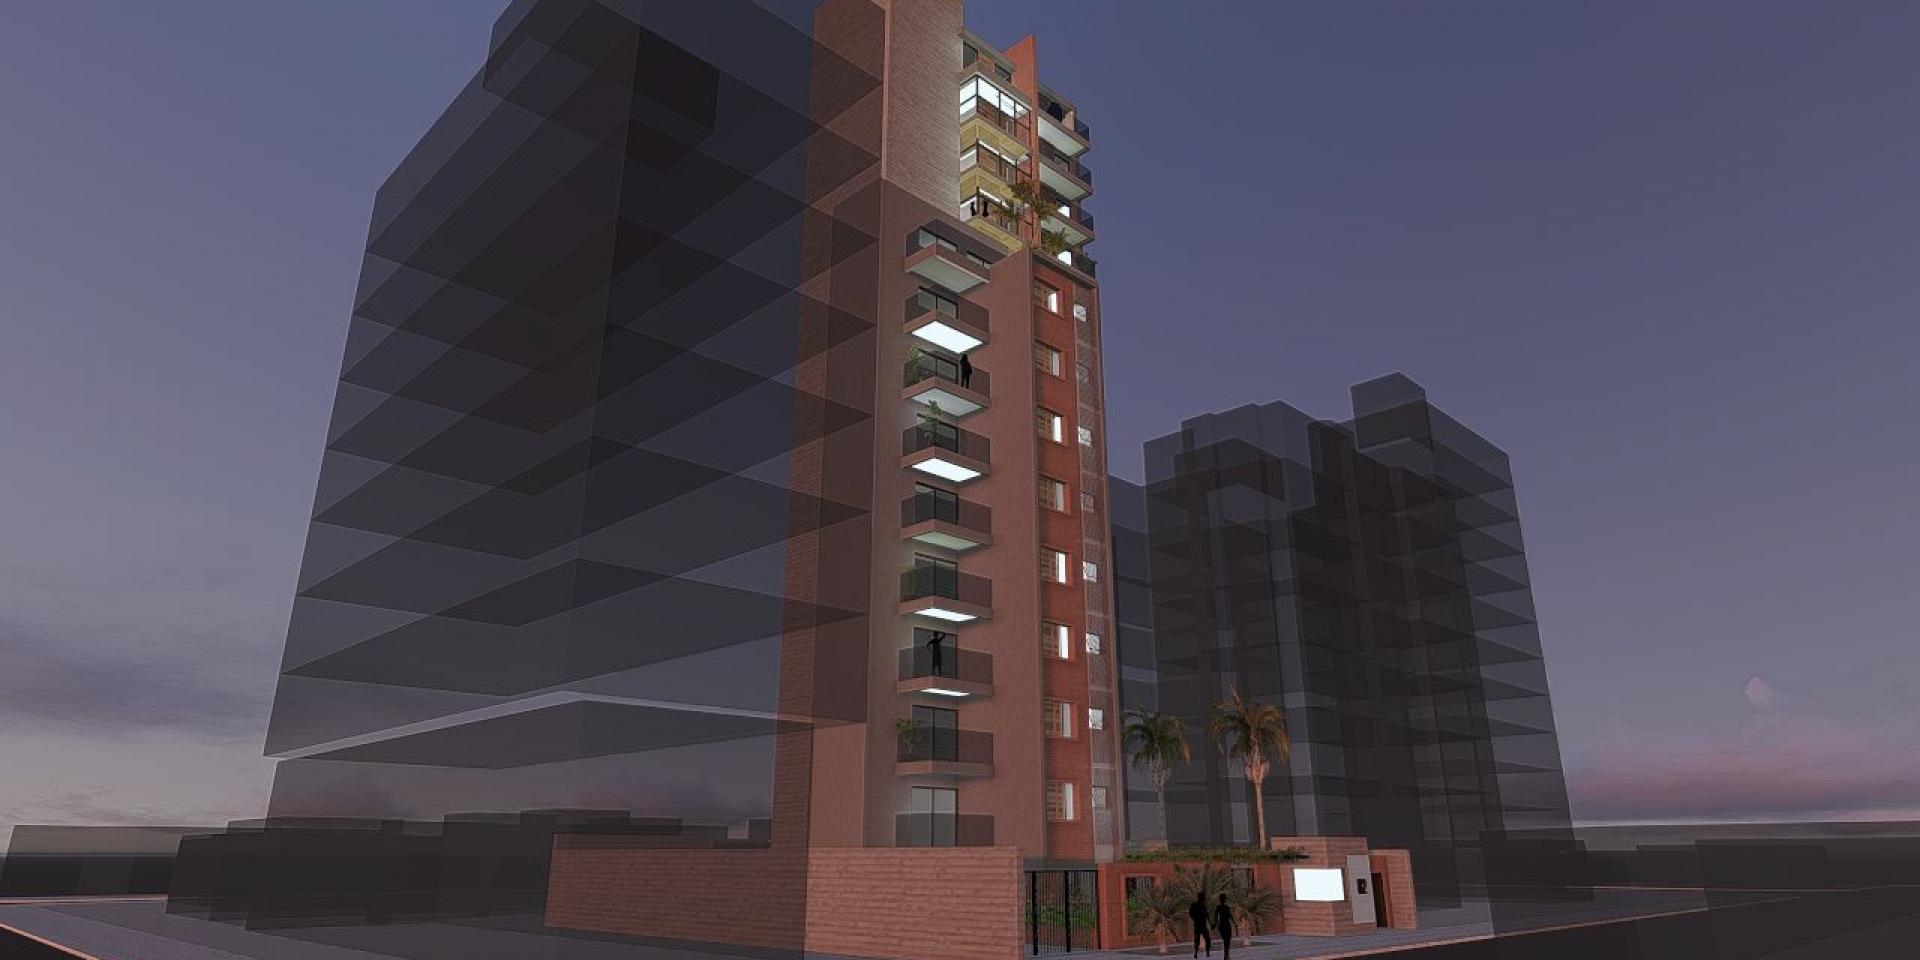 Edifício/Flats - Cambuí - Campinas | SP